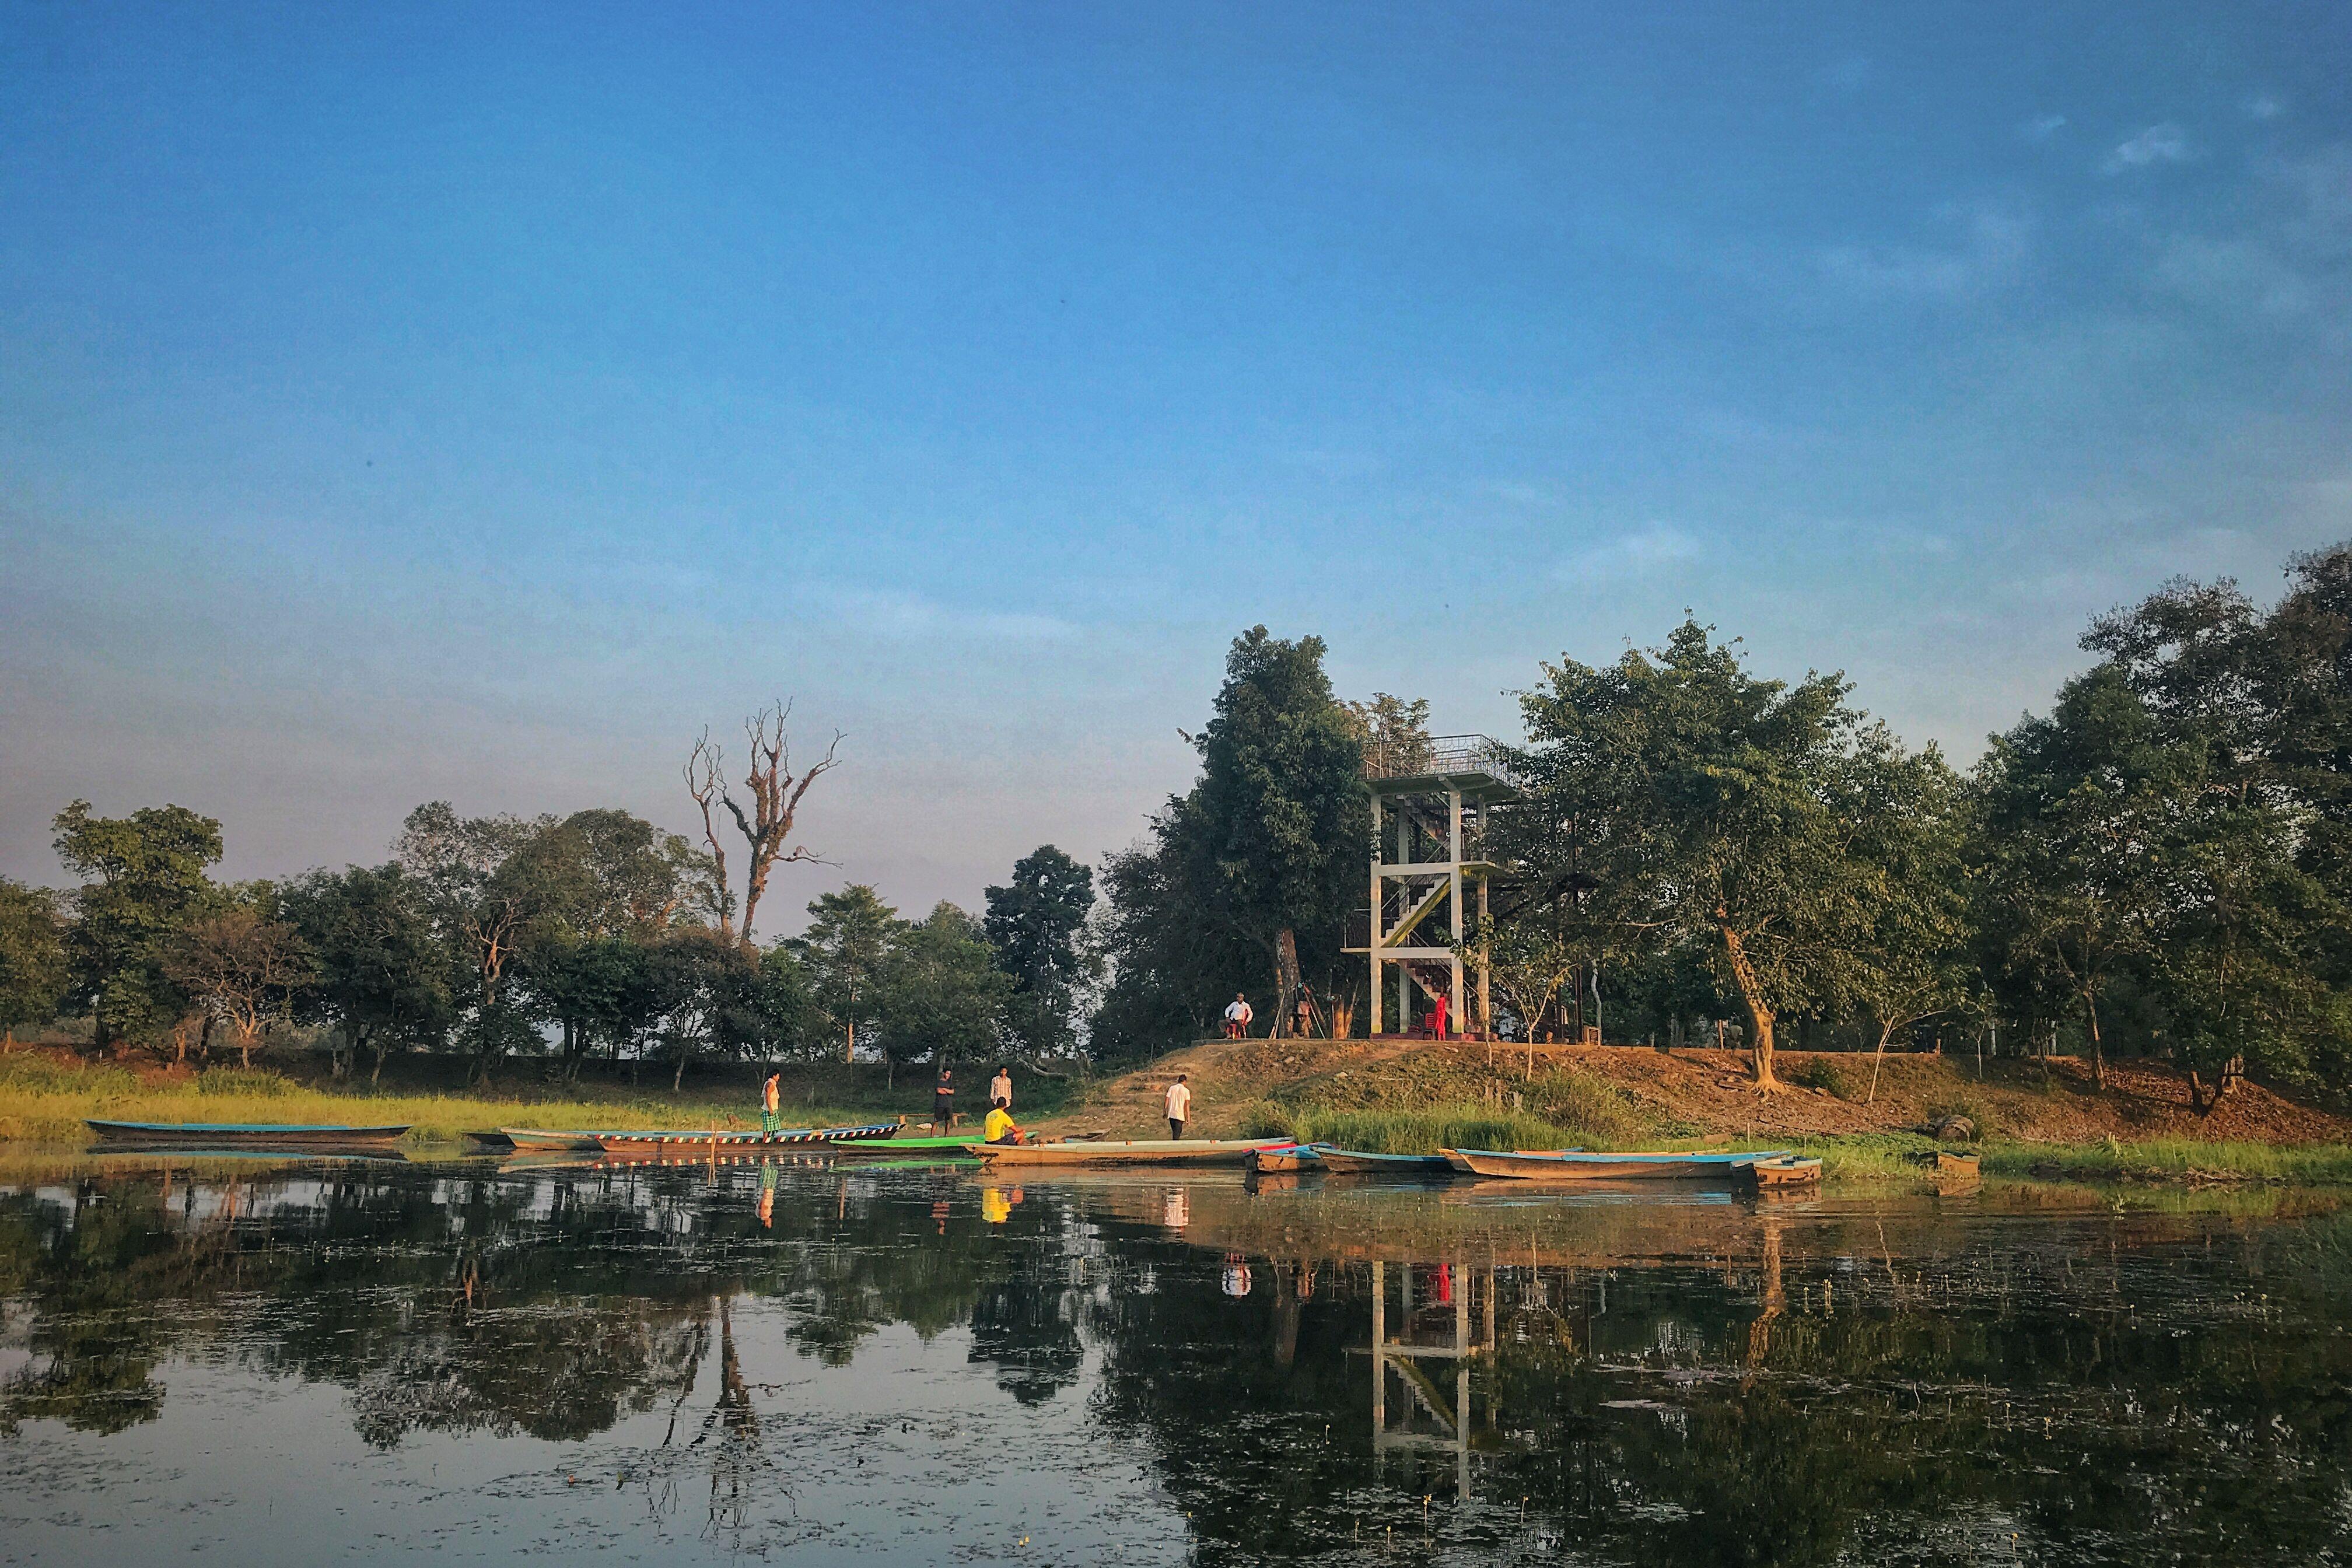 Chandubi Lake Assam Lake Canal Structures